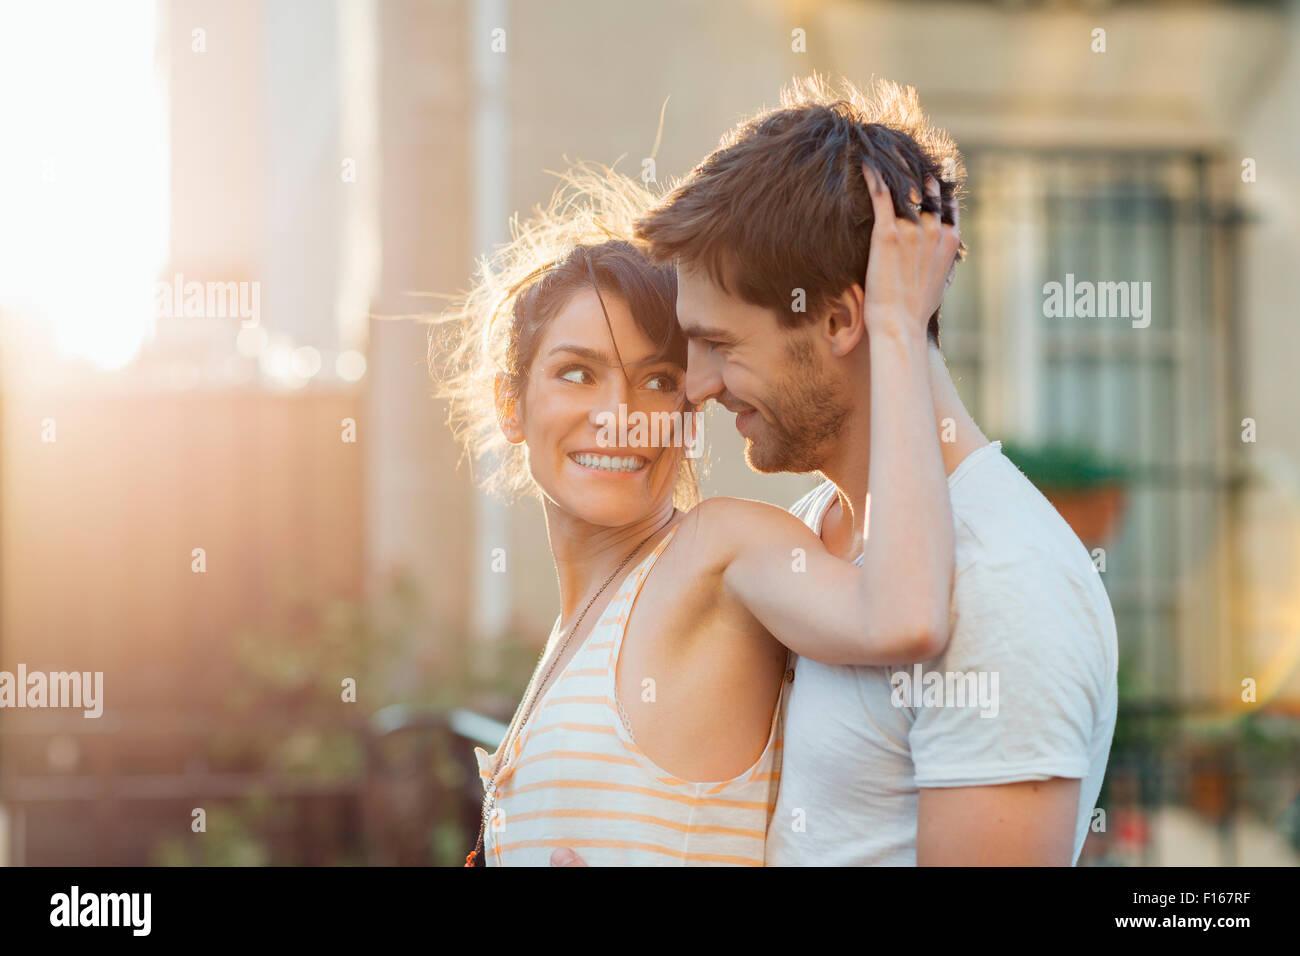 Paris, Couple dating in Montmartre - Stock Image